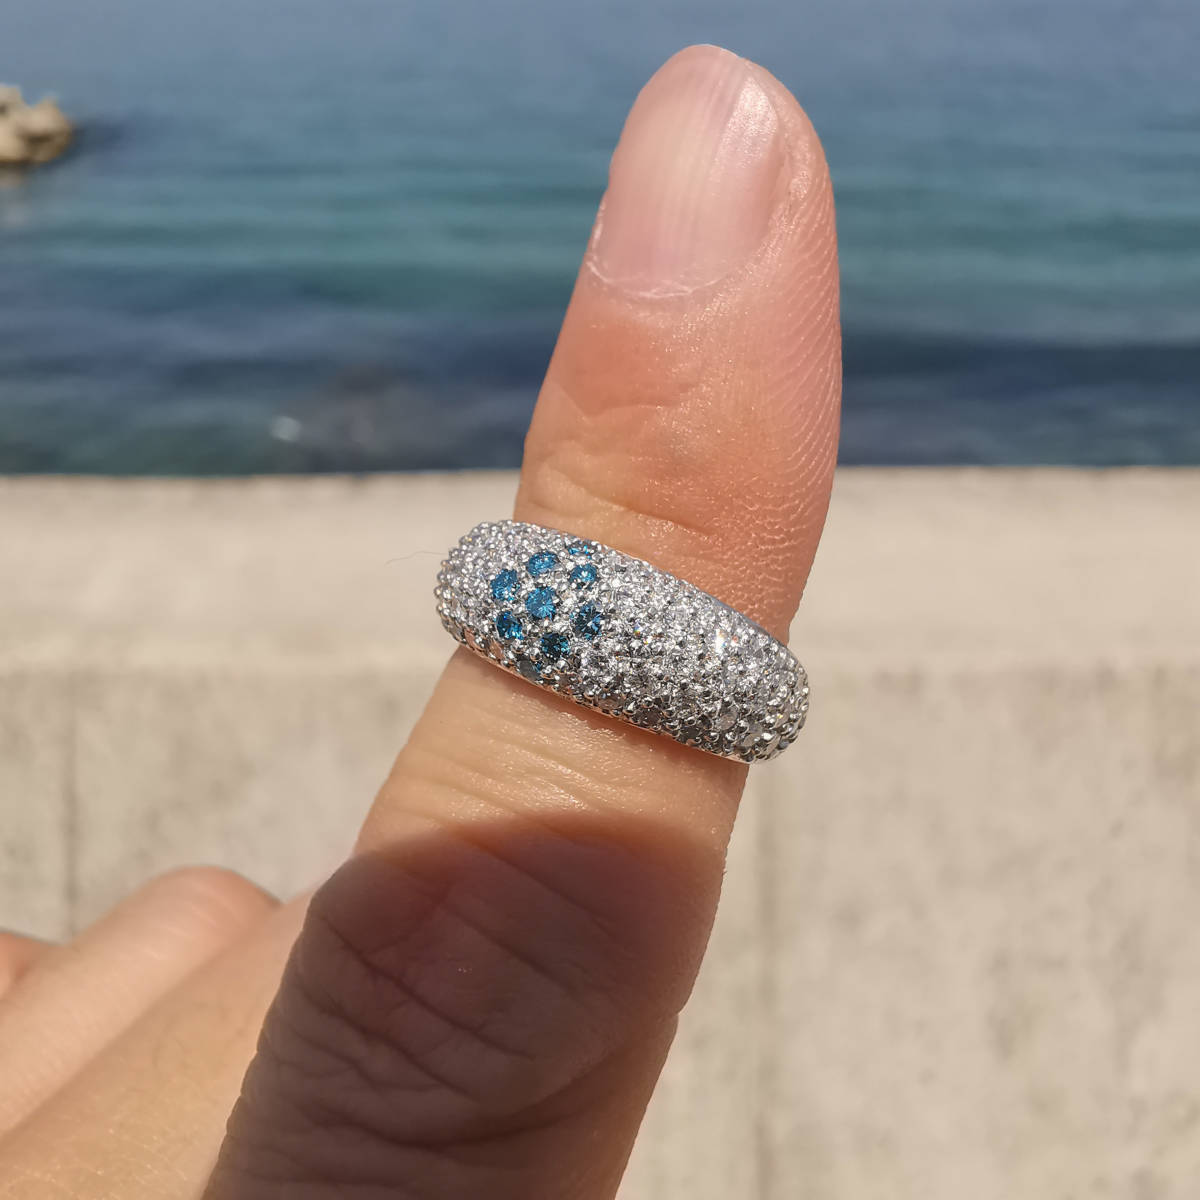 F0435 天然絶品ブルー&カラーレスダイヤモンド 最高級Pt900無垢リング サイズ9.5号 重量5.0g 縦幅7.3mm